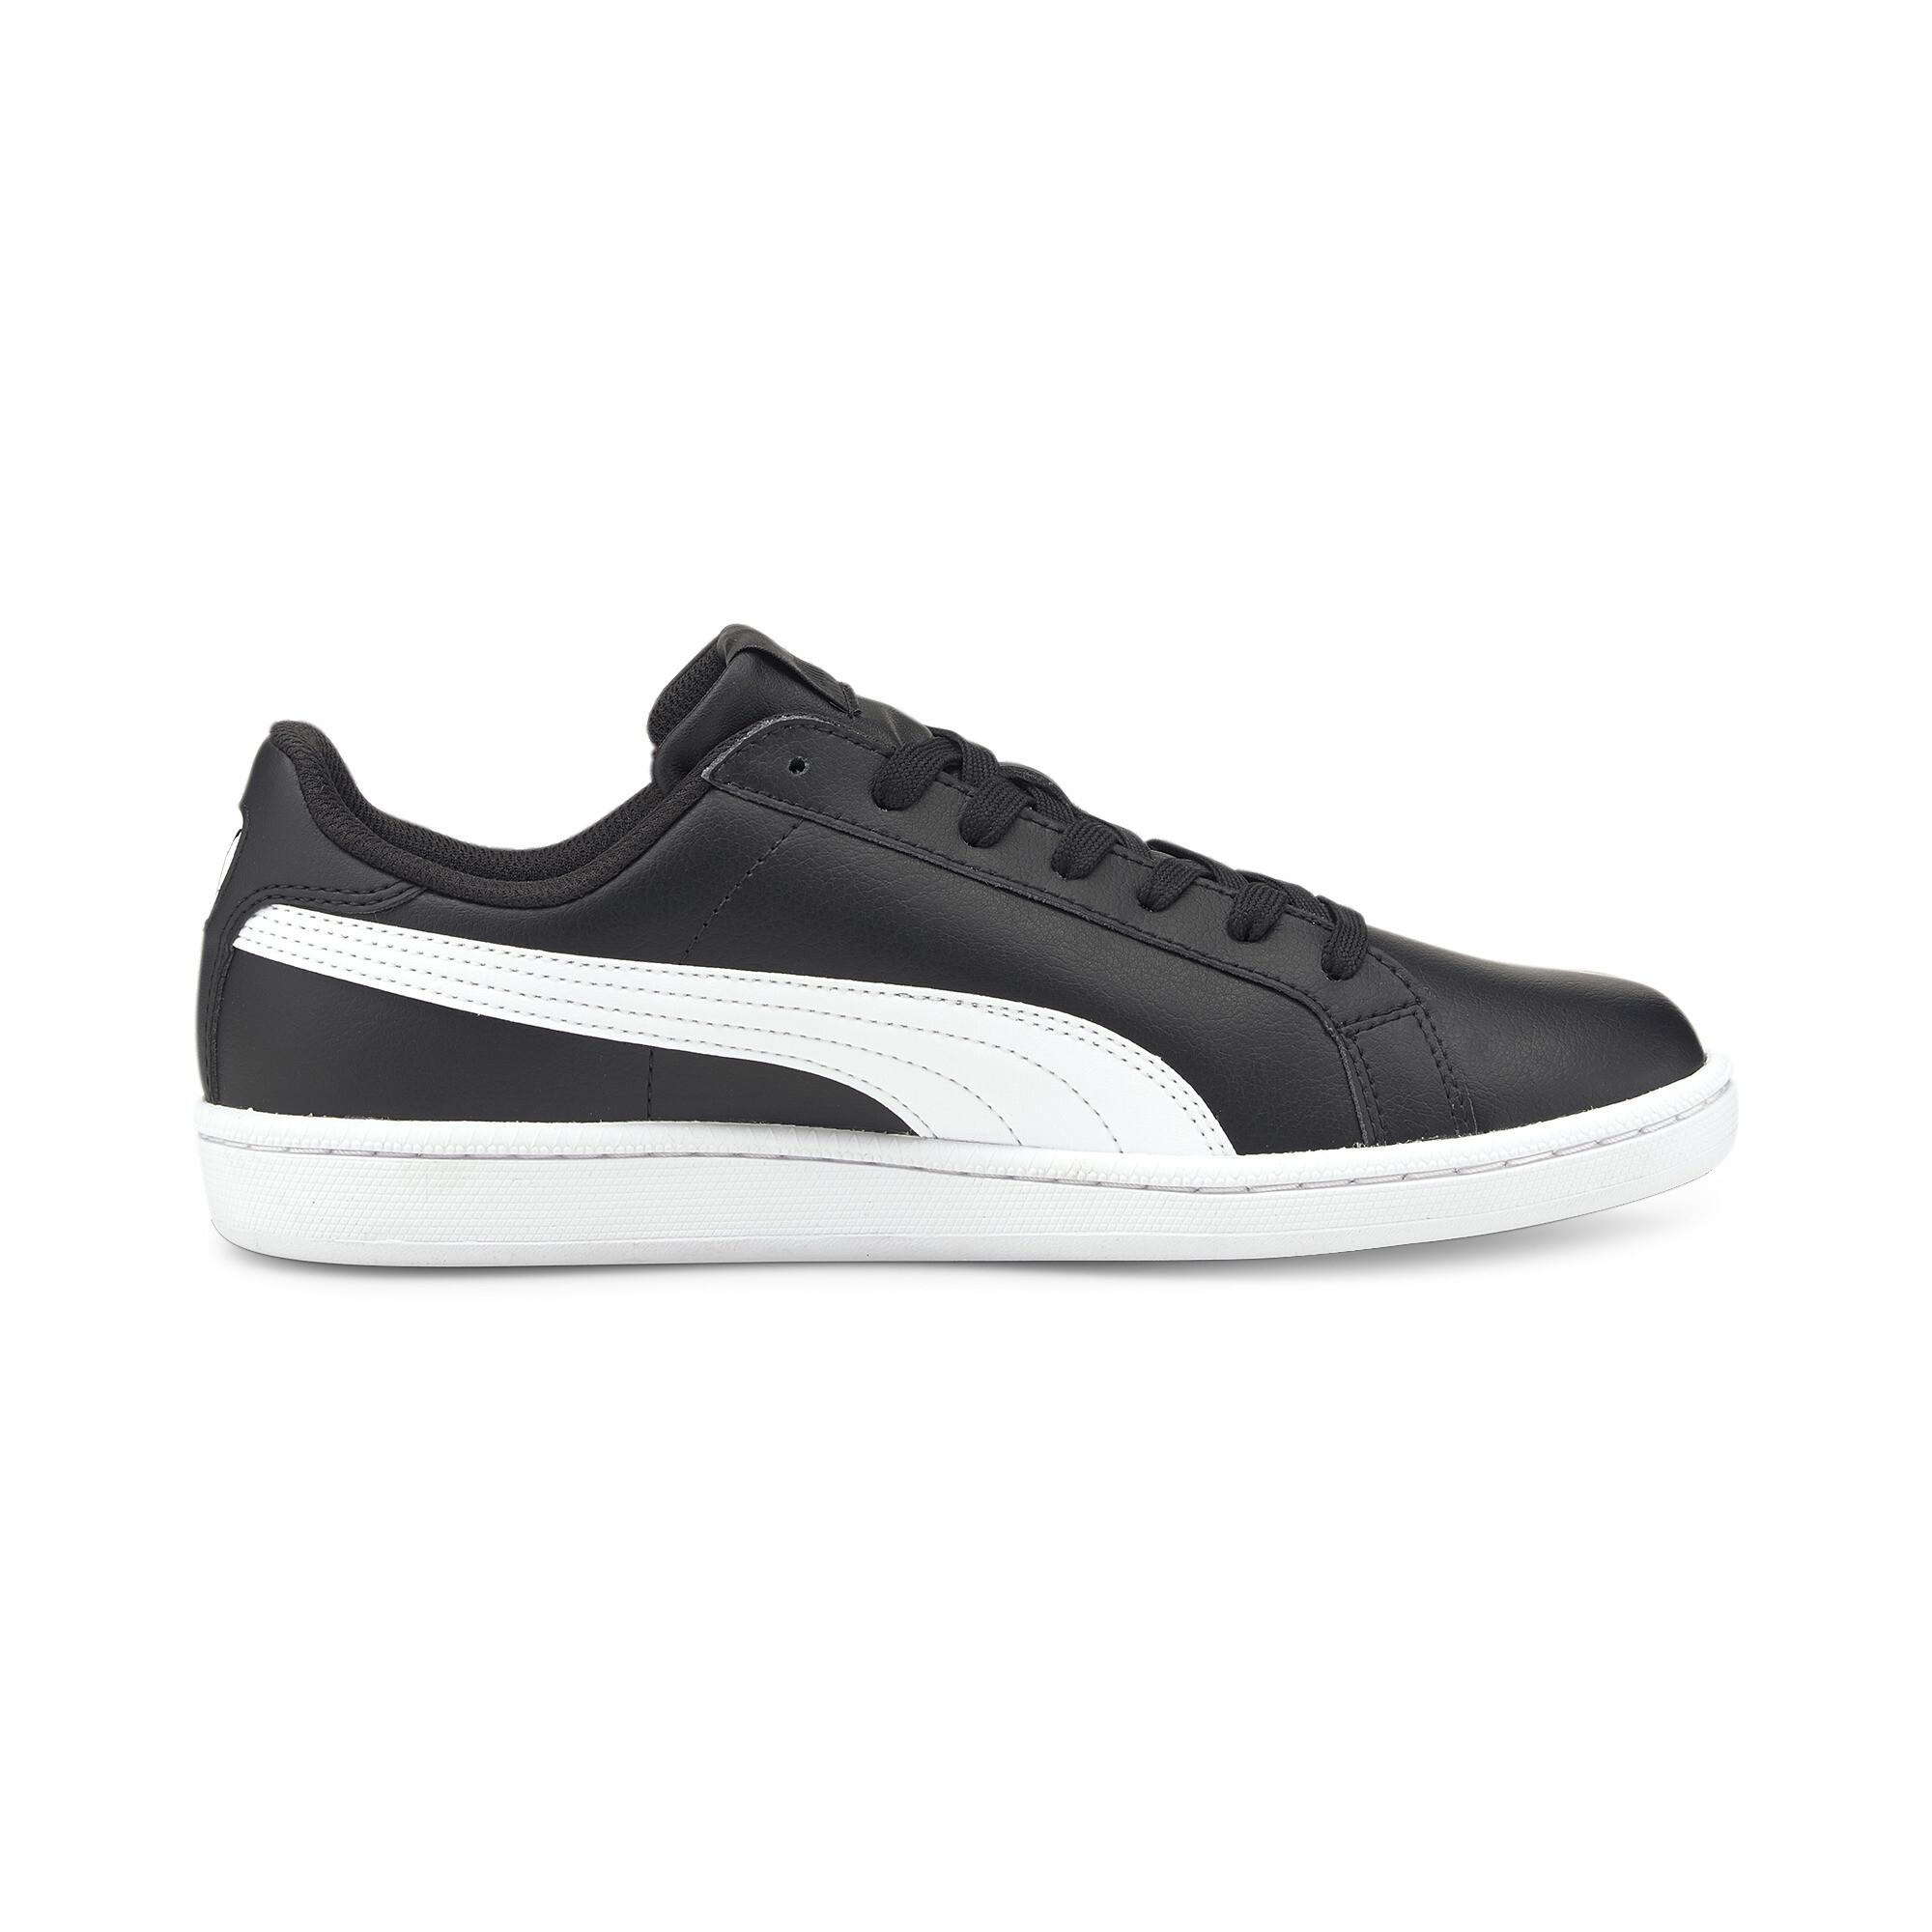 Indexbild 21 - PUMA Smash Trainers Schuhe Sneakers Sport Classics Unisex Neu